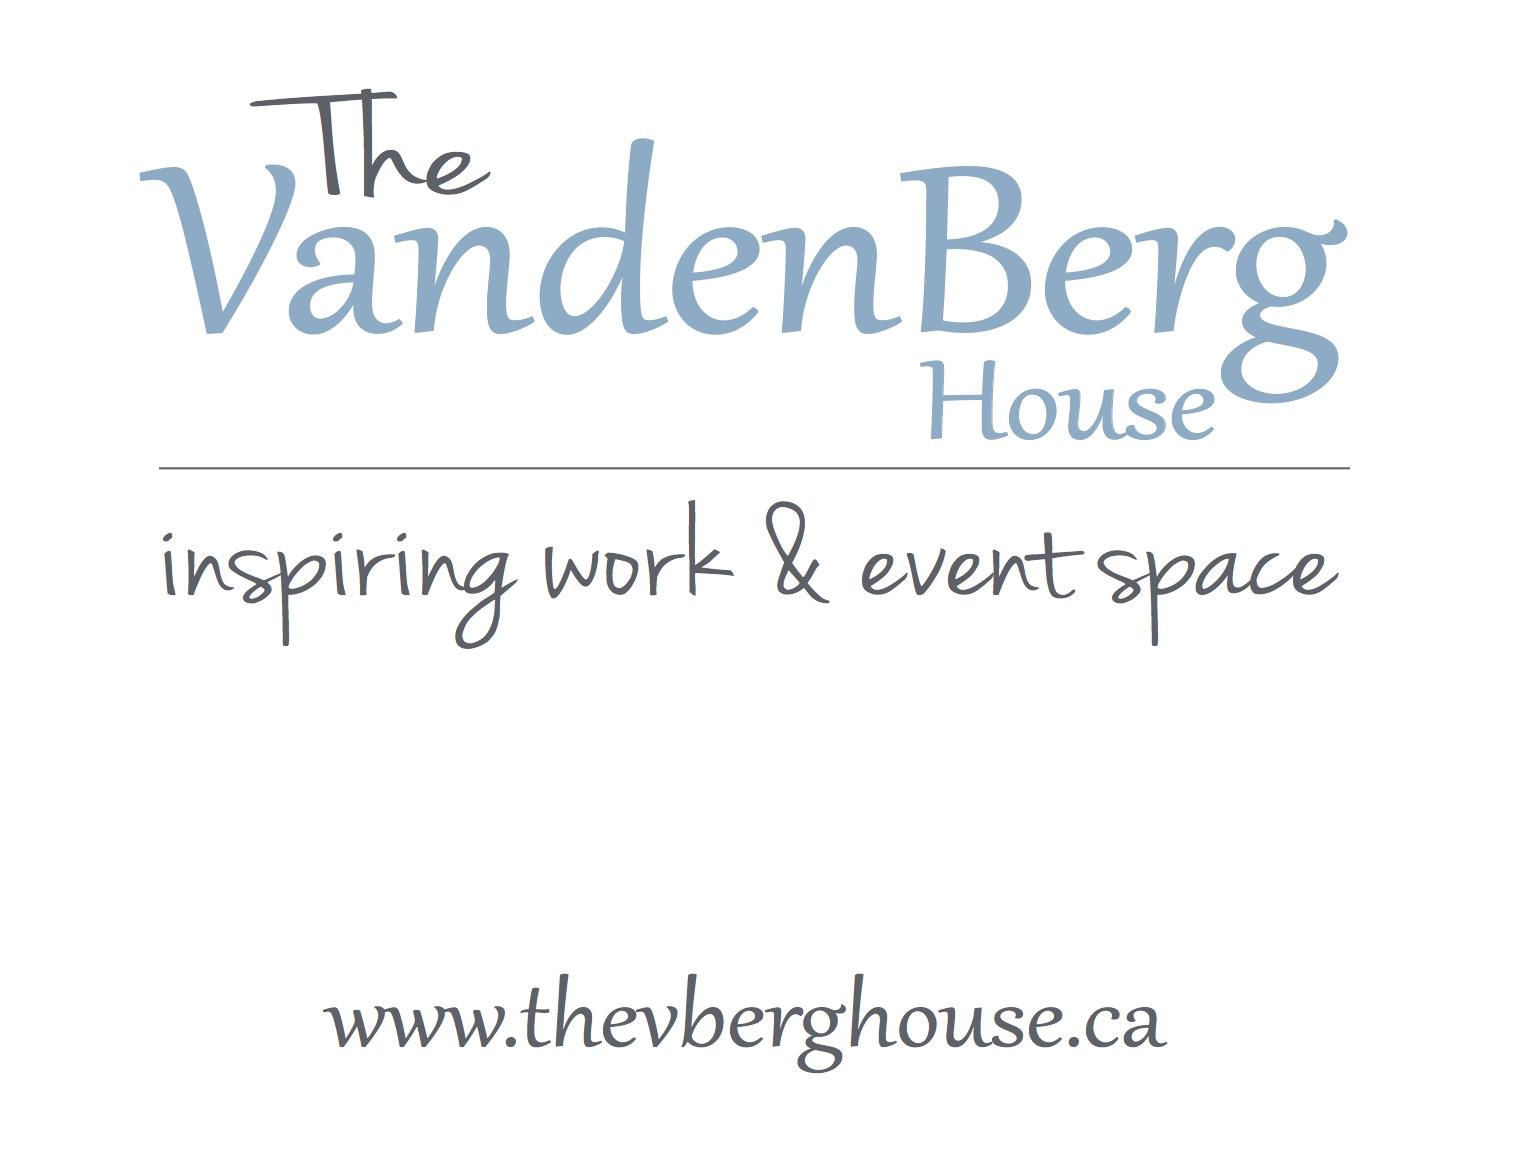 The VandenBerg House